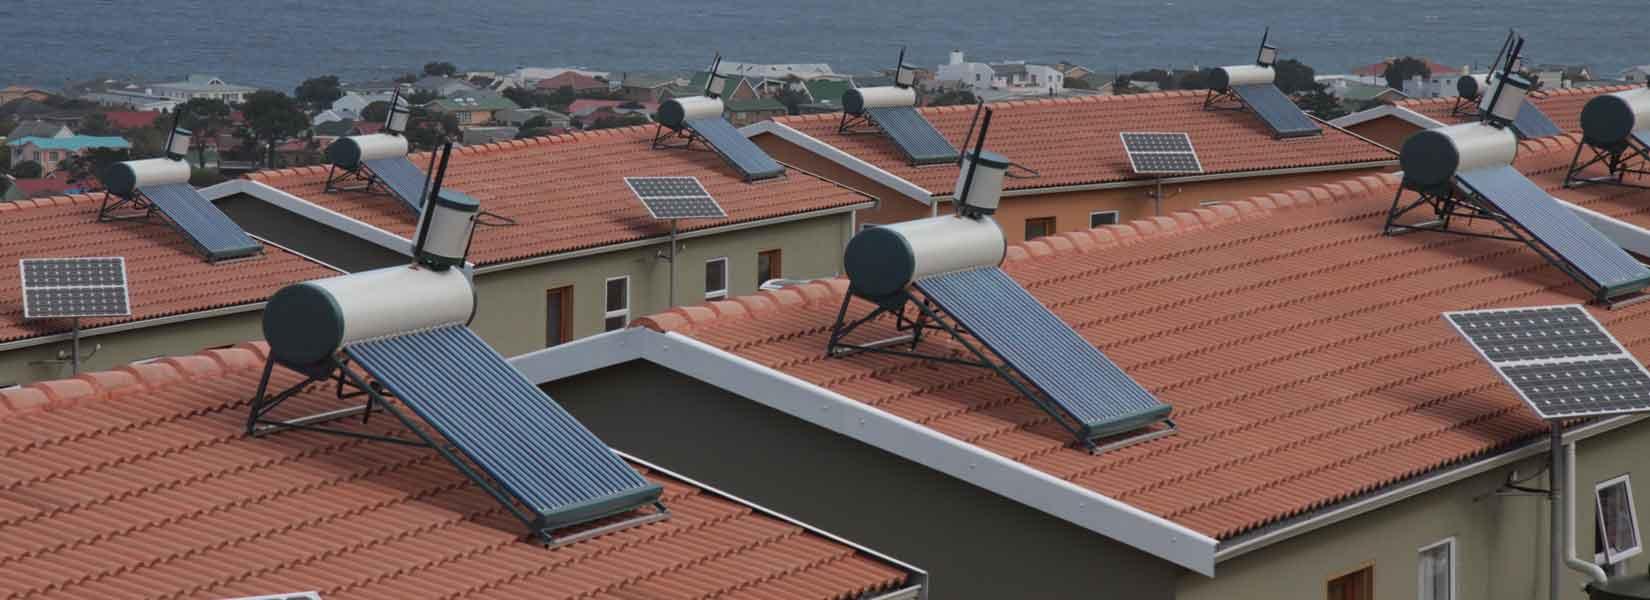 فروش آبگرمکن خورشیدی